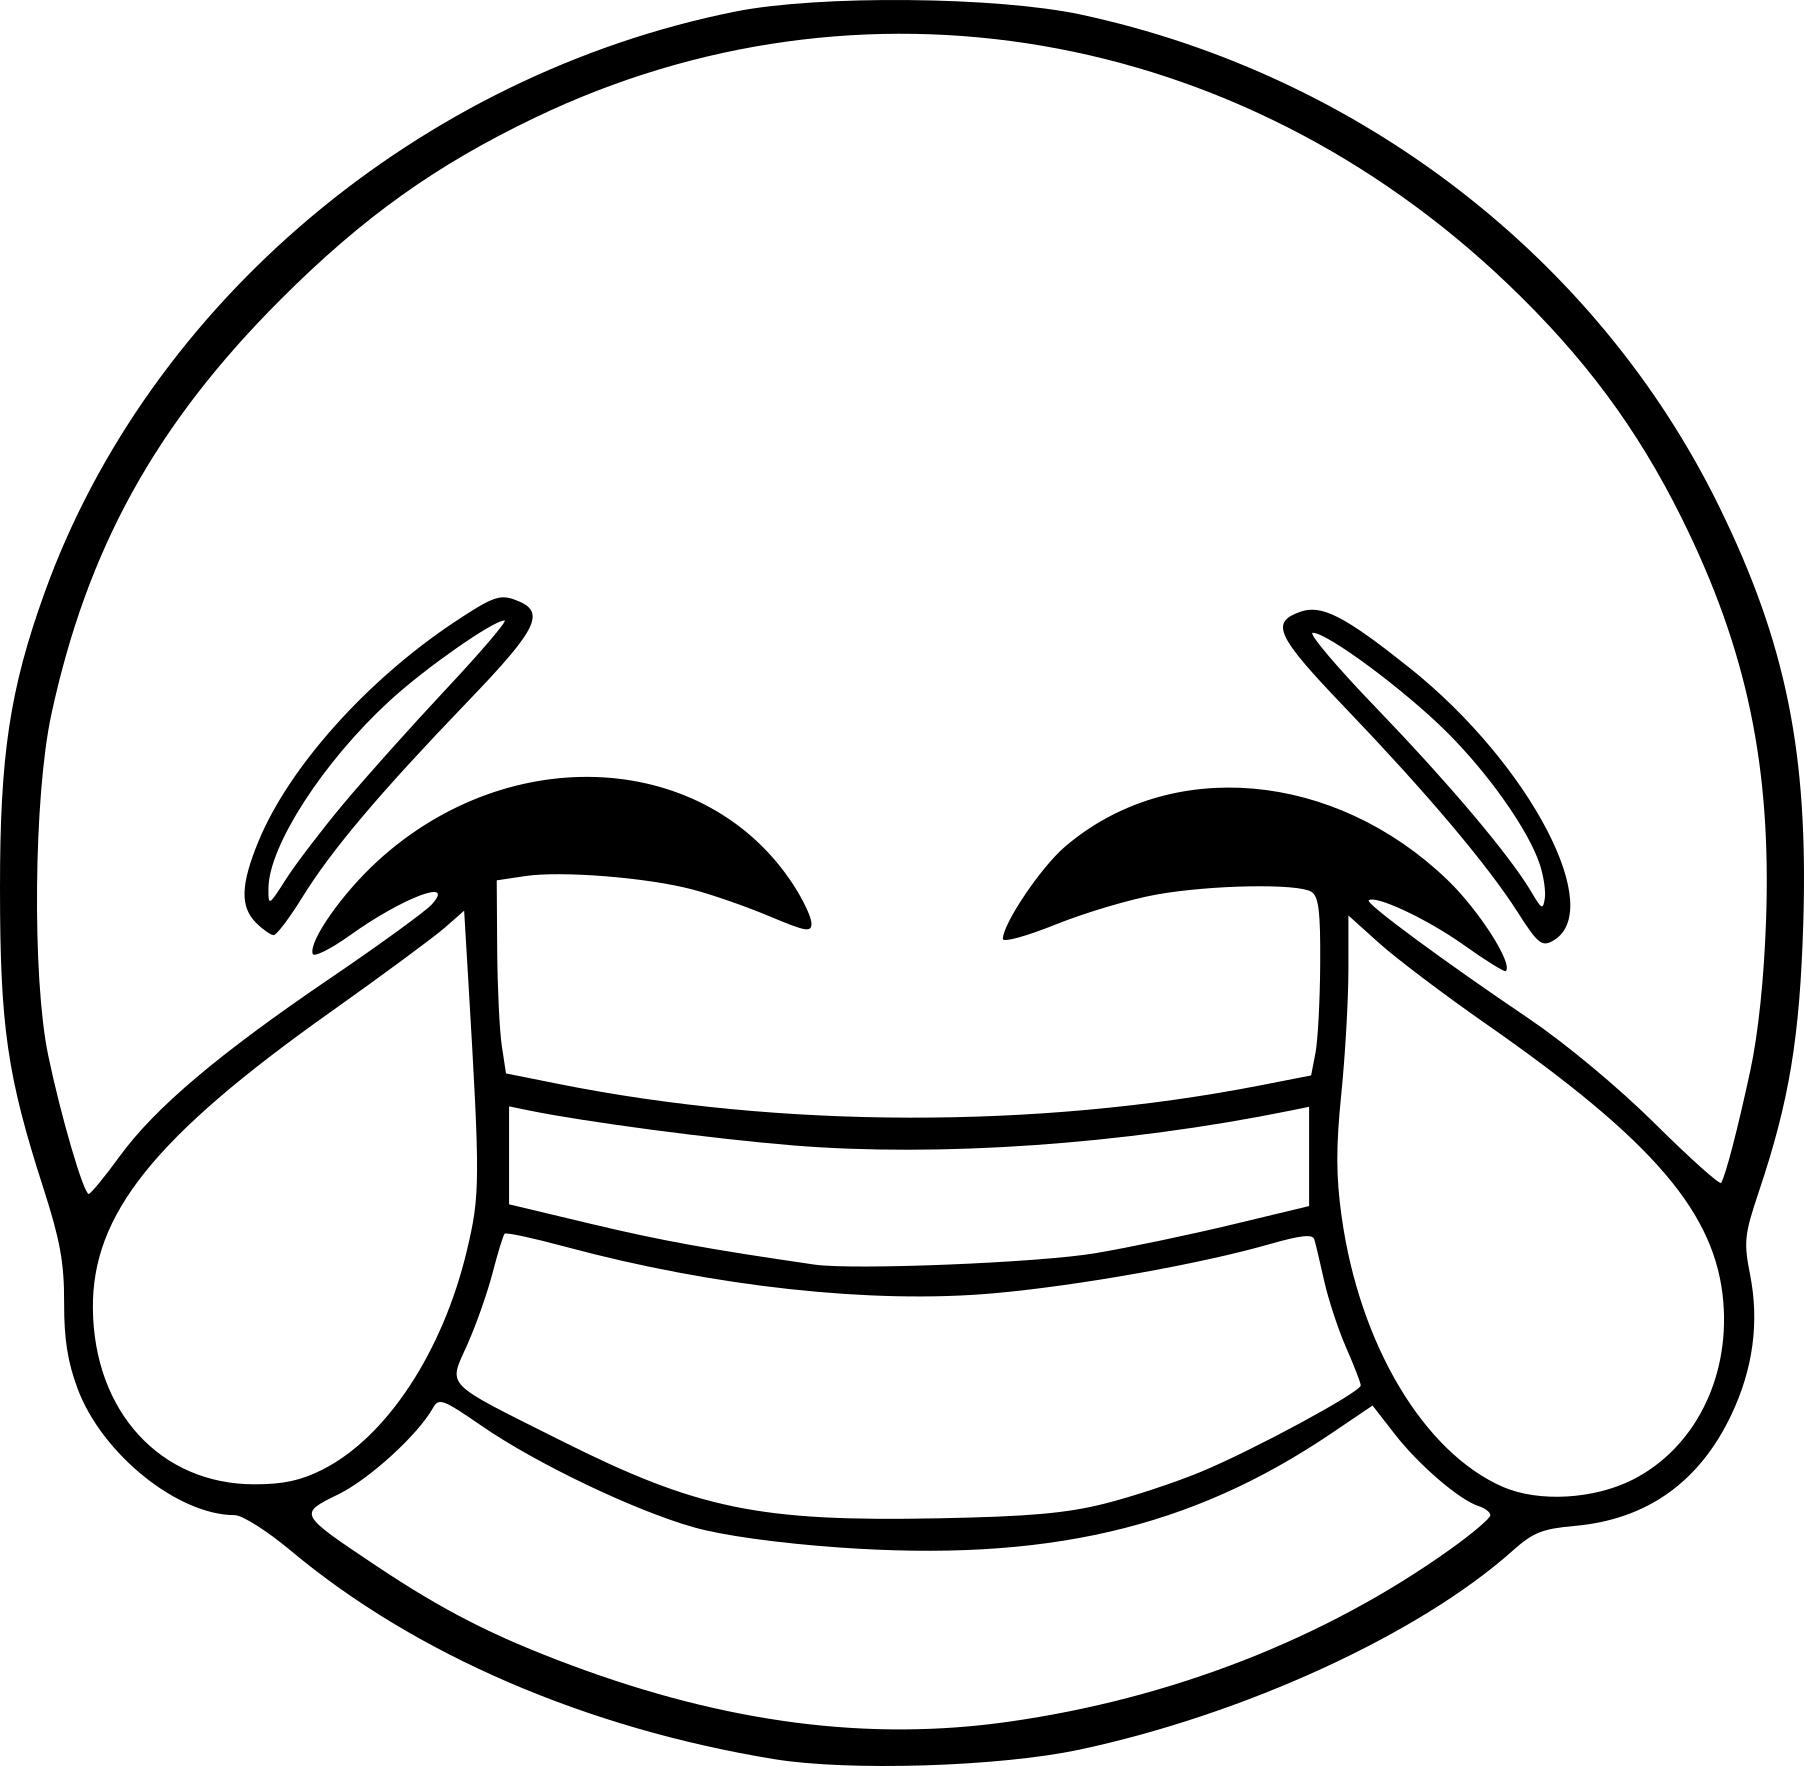 coloriage a imprimer emoji